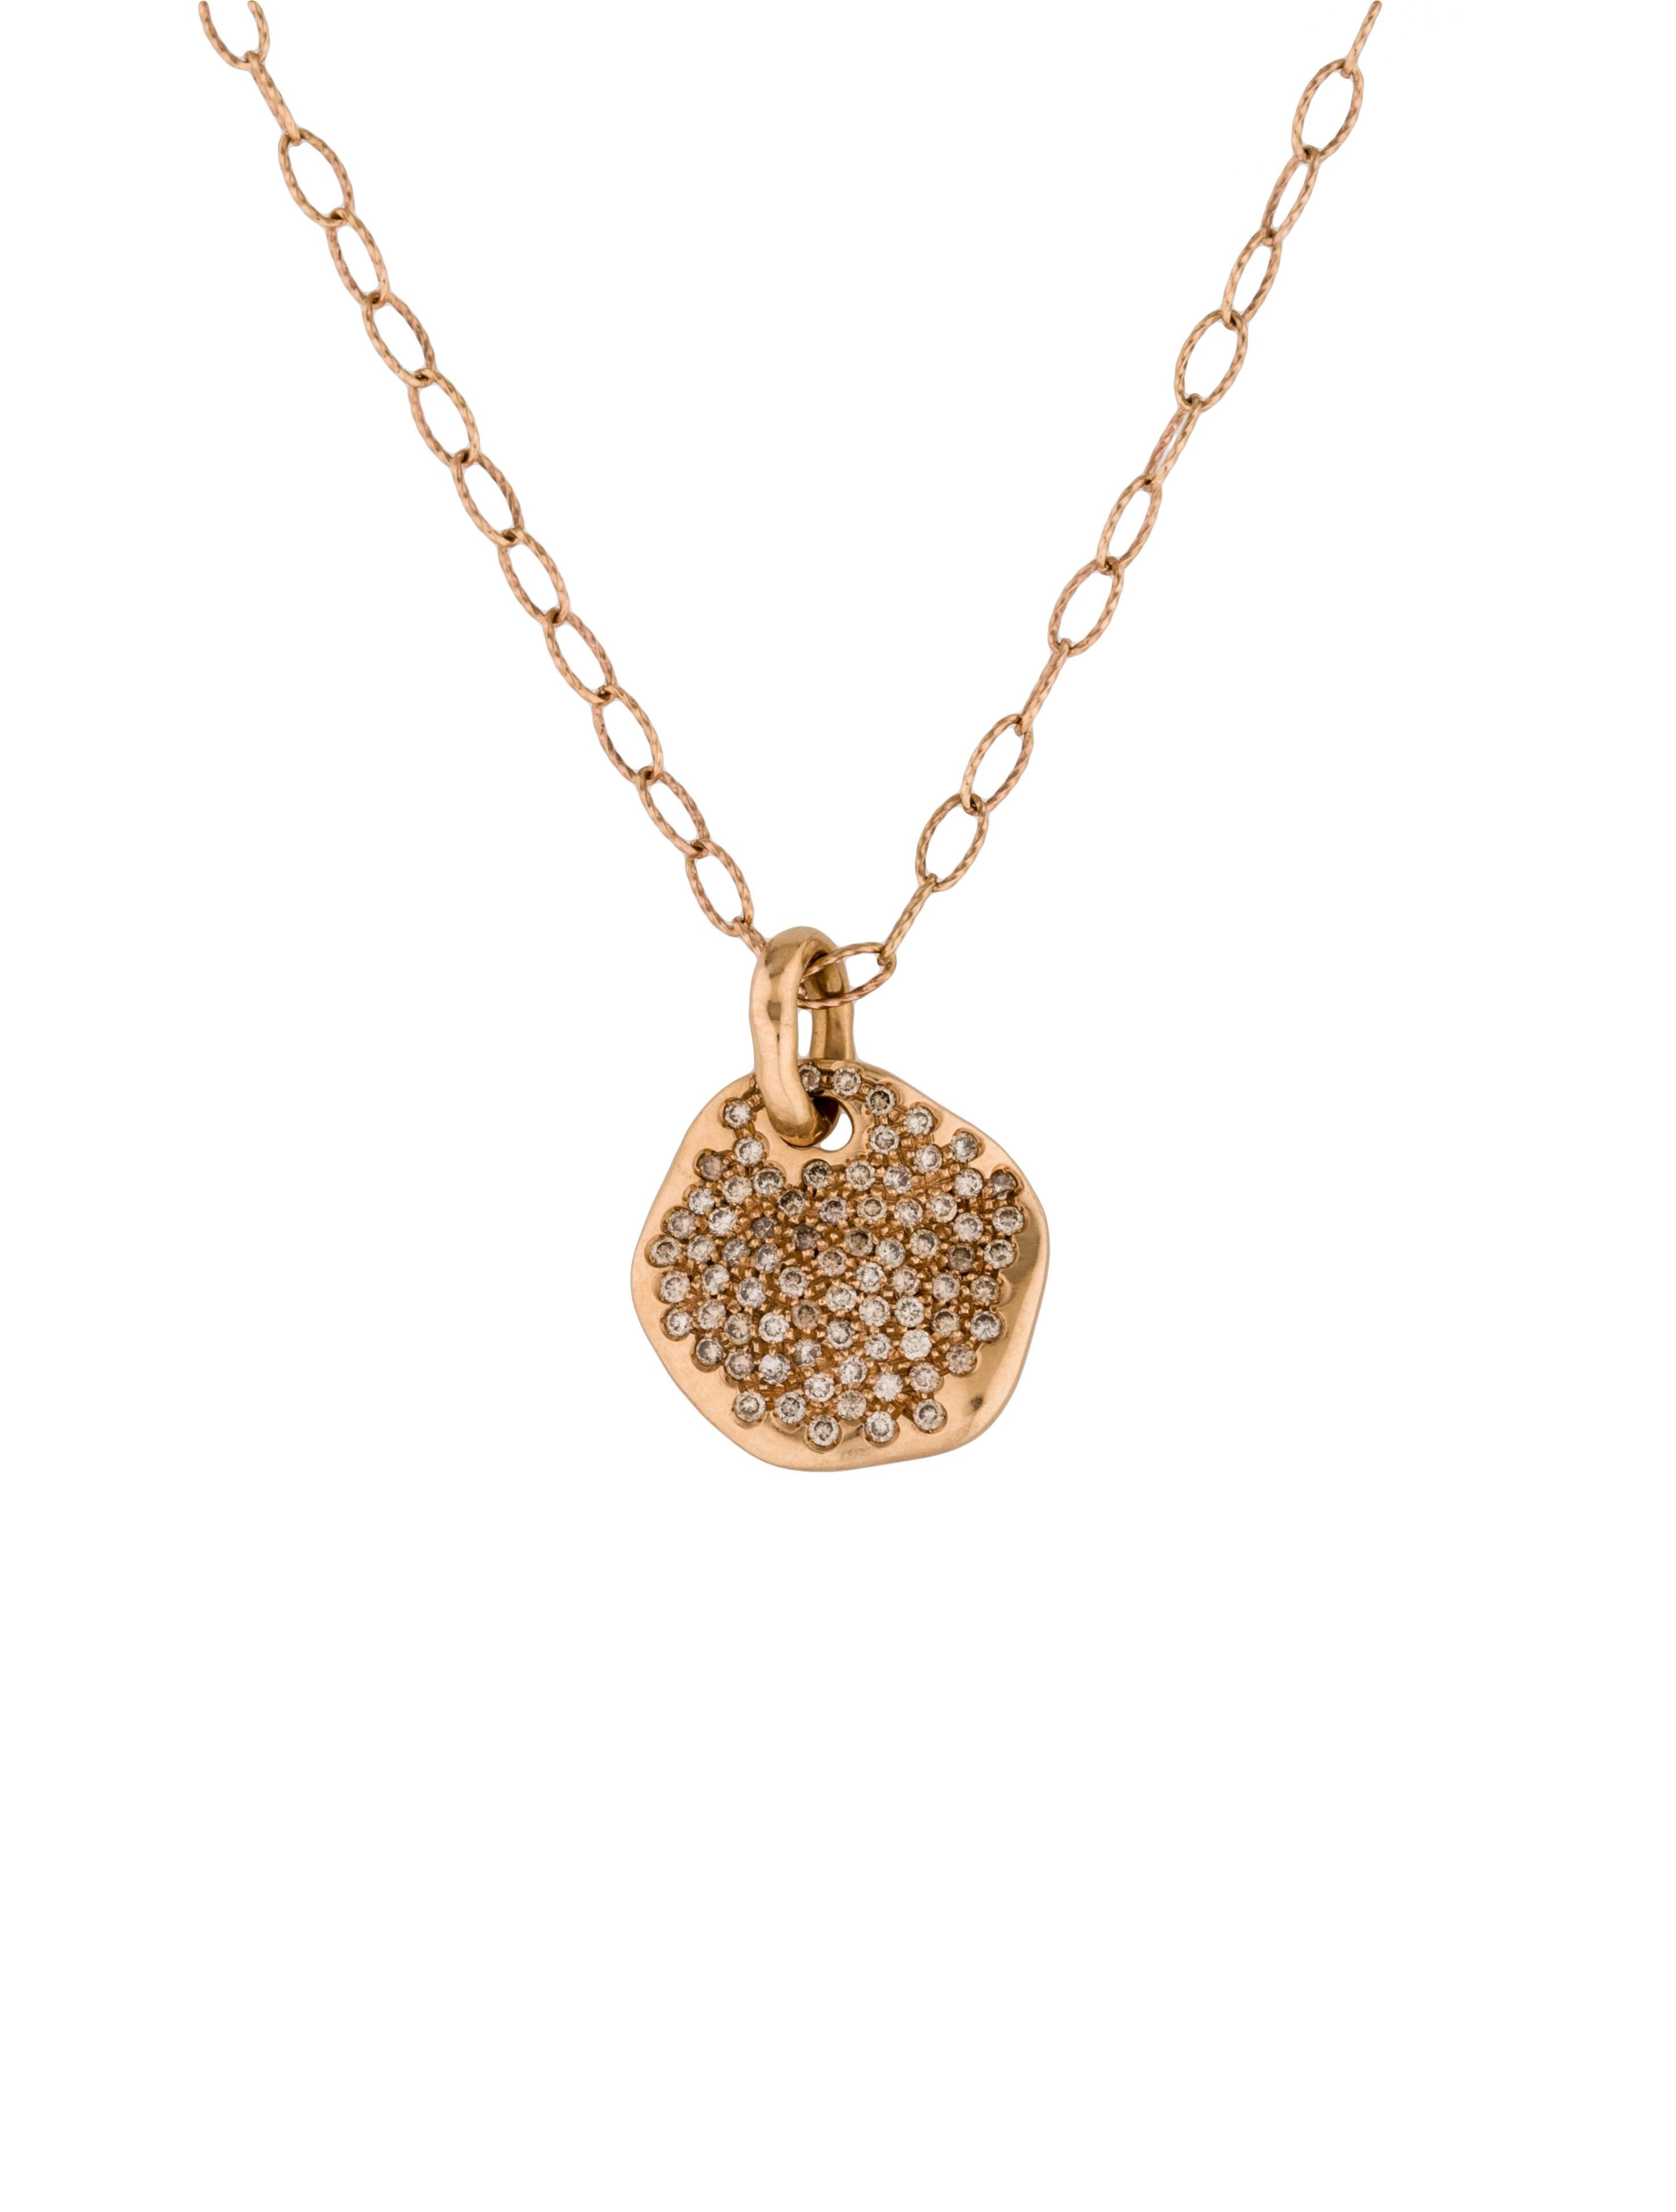 Antonini gioielli 18k pav diamond pendant necklace necklaces 18k pav diamond pendant necklace aloadofball Images